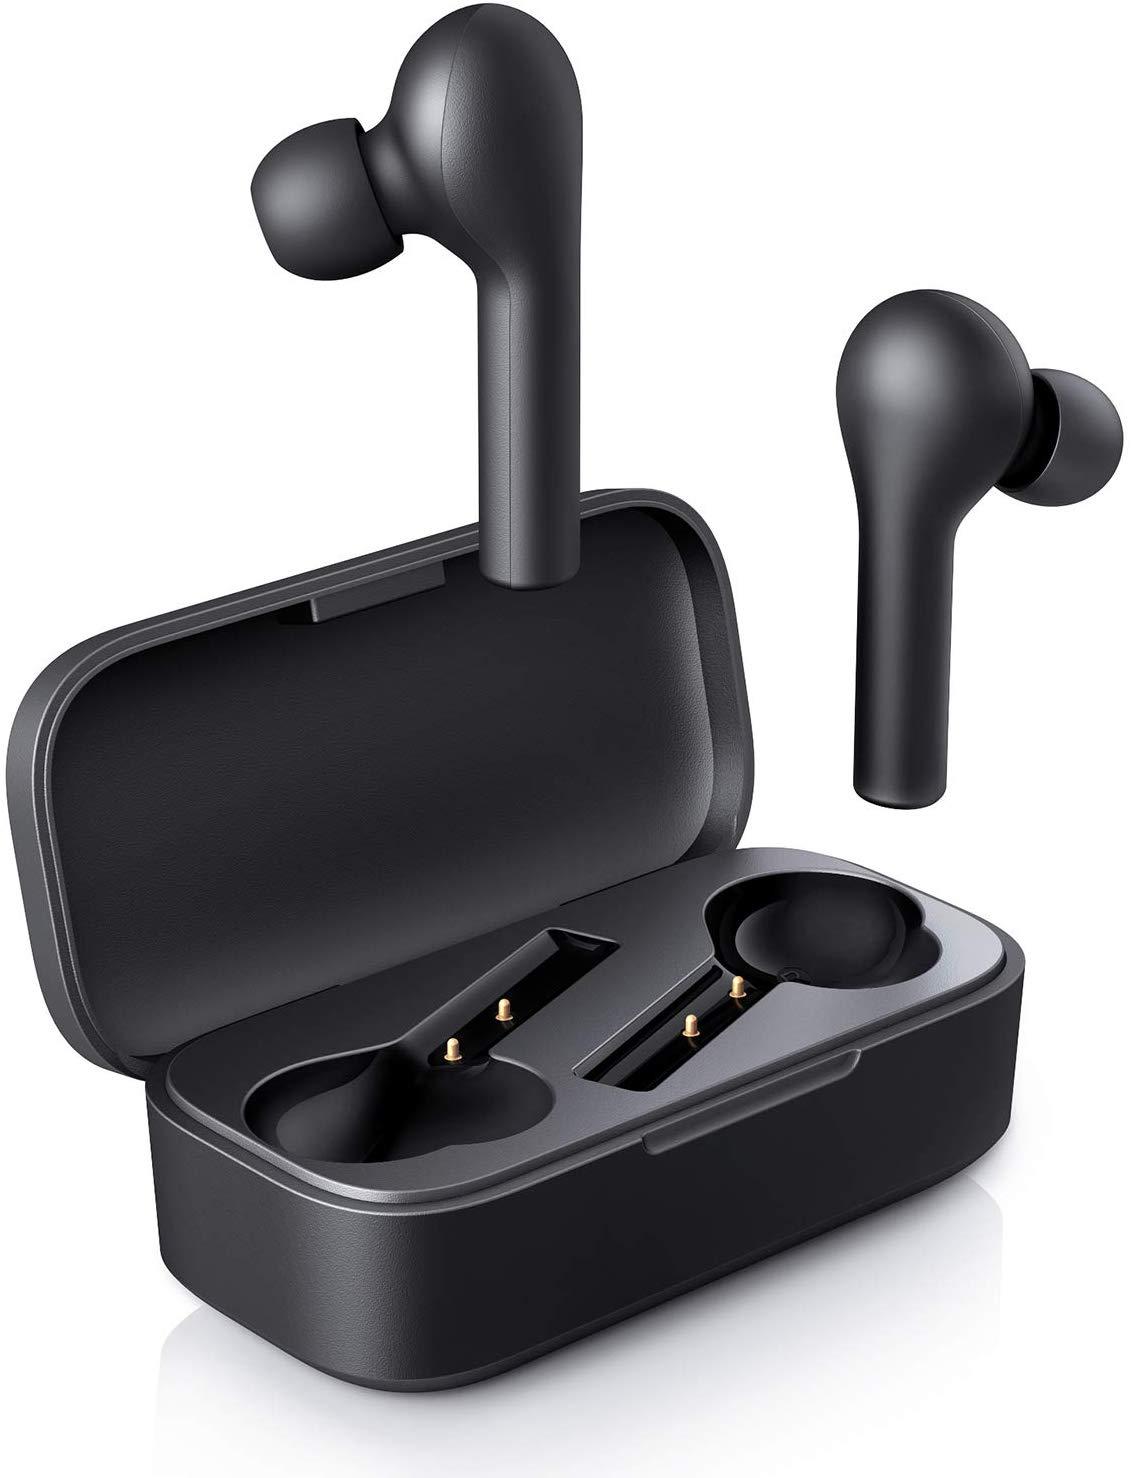 AUKEY Wireless Headphones, Bluetooth Headphones 5.0 with Charging Case, 5h + 20h Playtime, Waterproof £25.49 @ Amazon